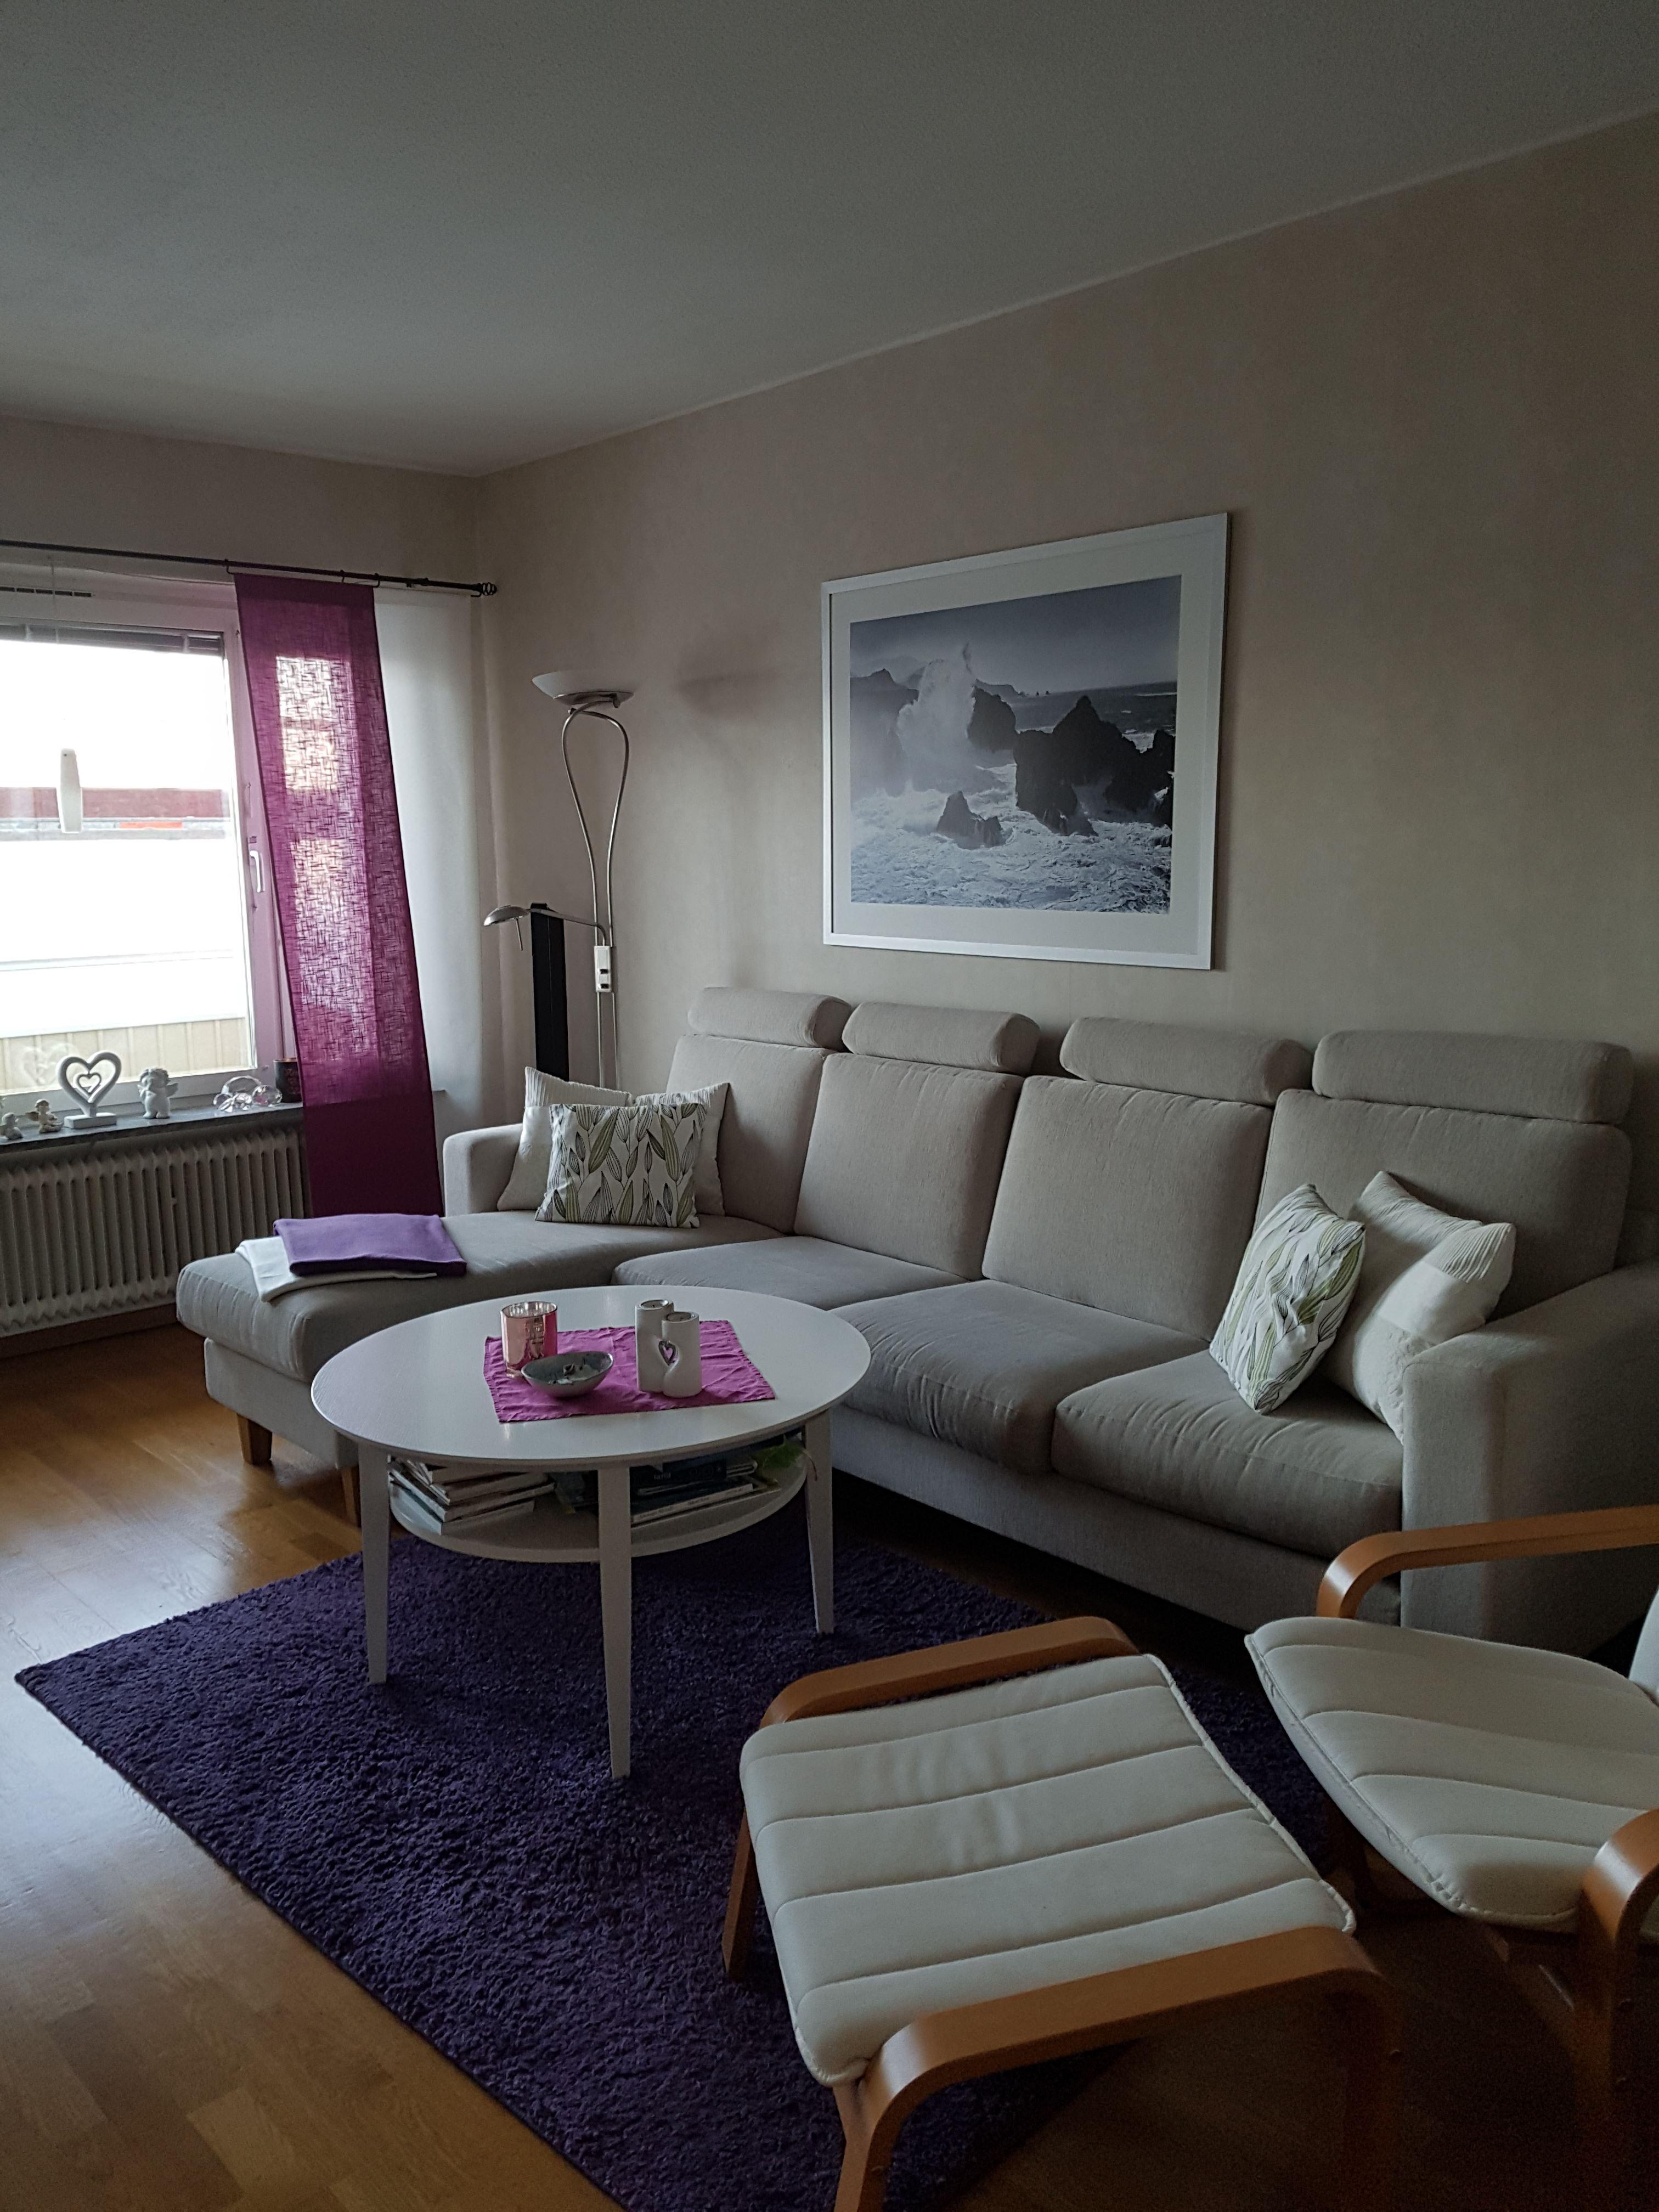 HL186 Apartment in Östersund